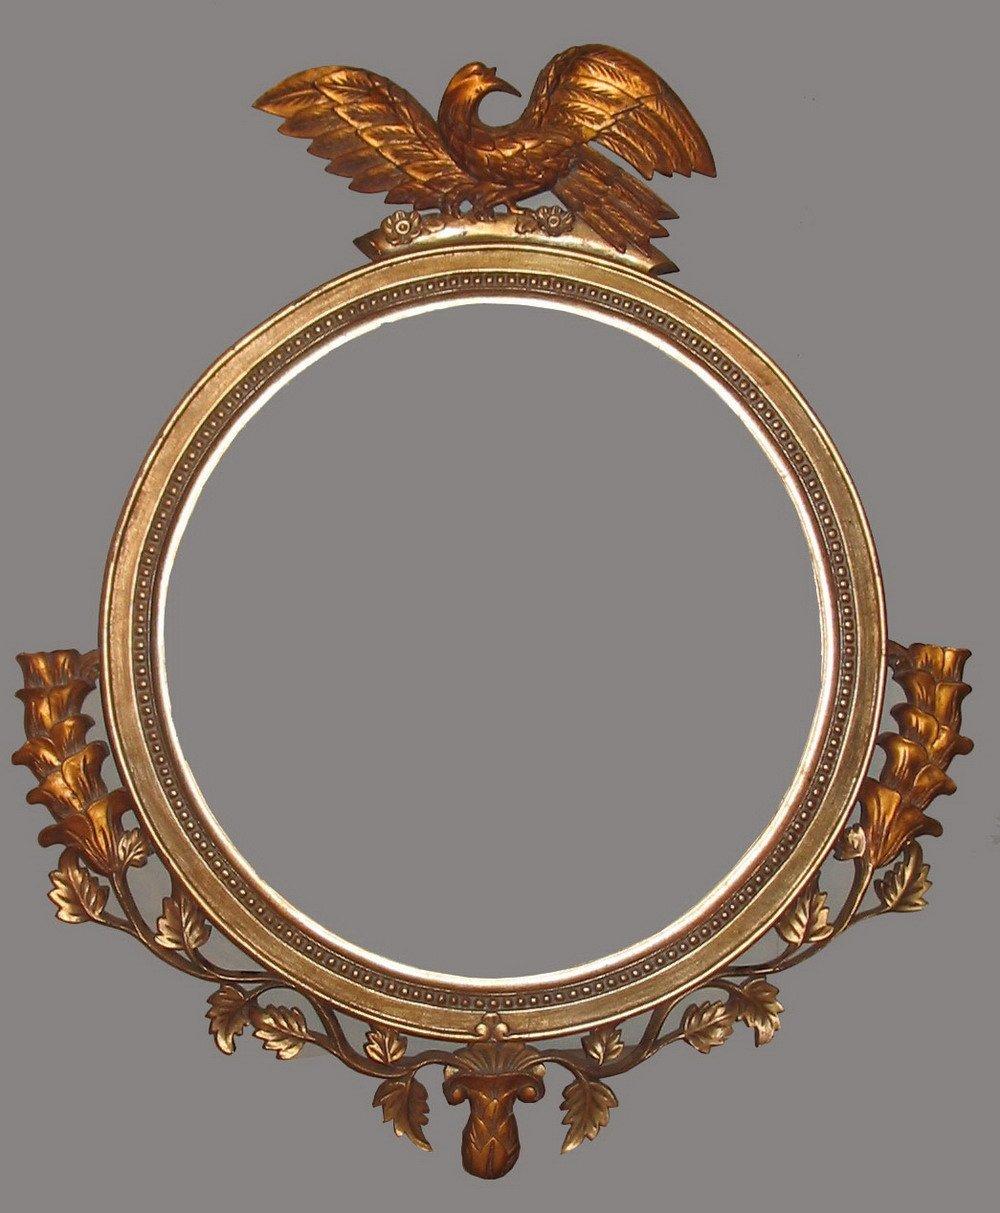 Adler spiegel rahmen spiegel produkt id 101615283 german for Spiegel id